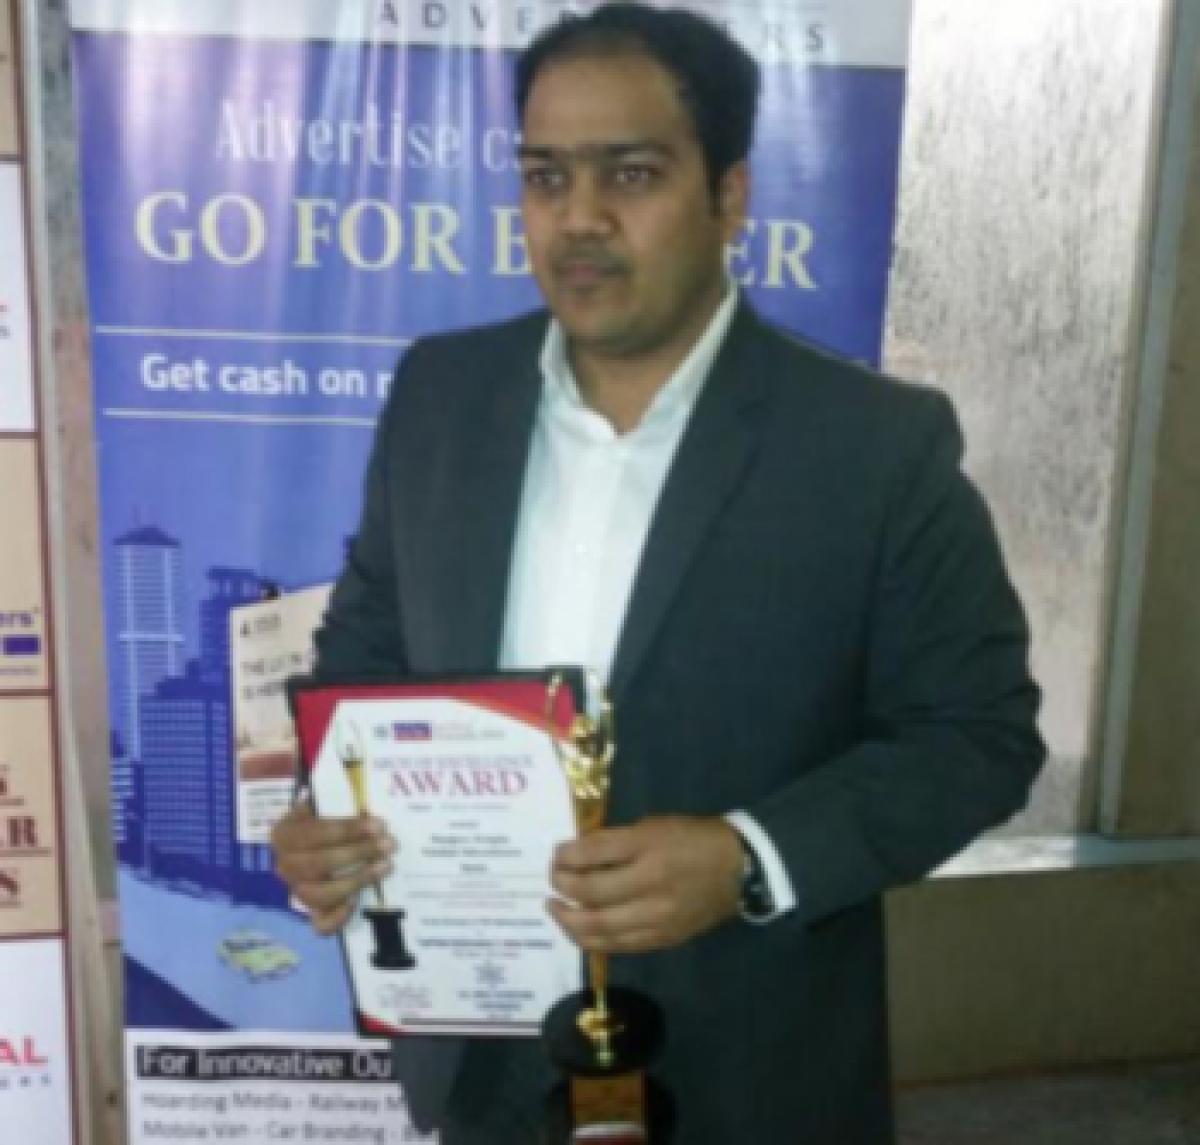 Golden Achiever Award for Sanjeev Gupta